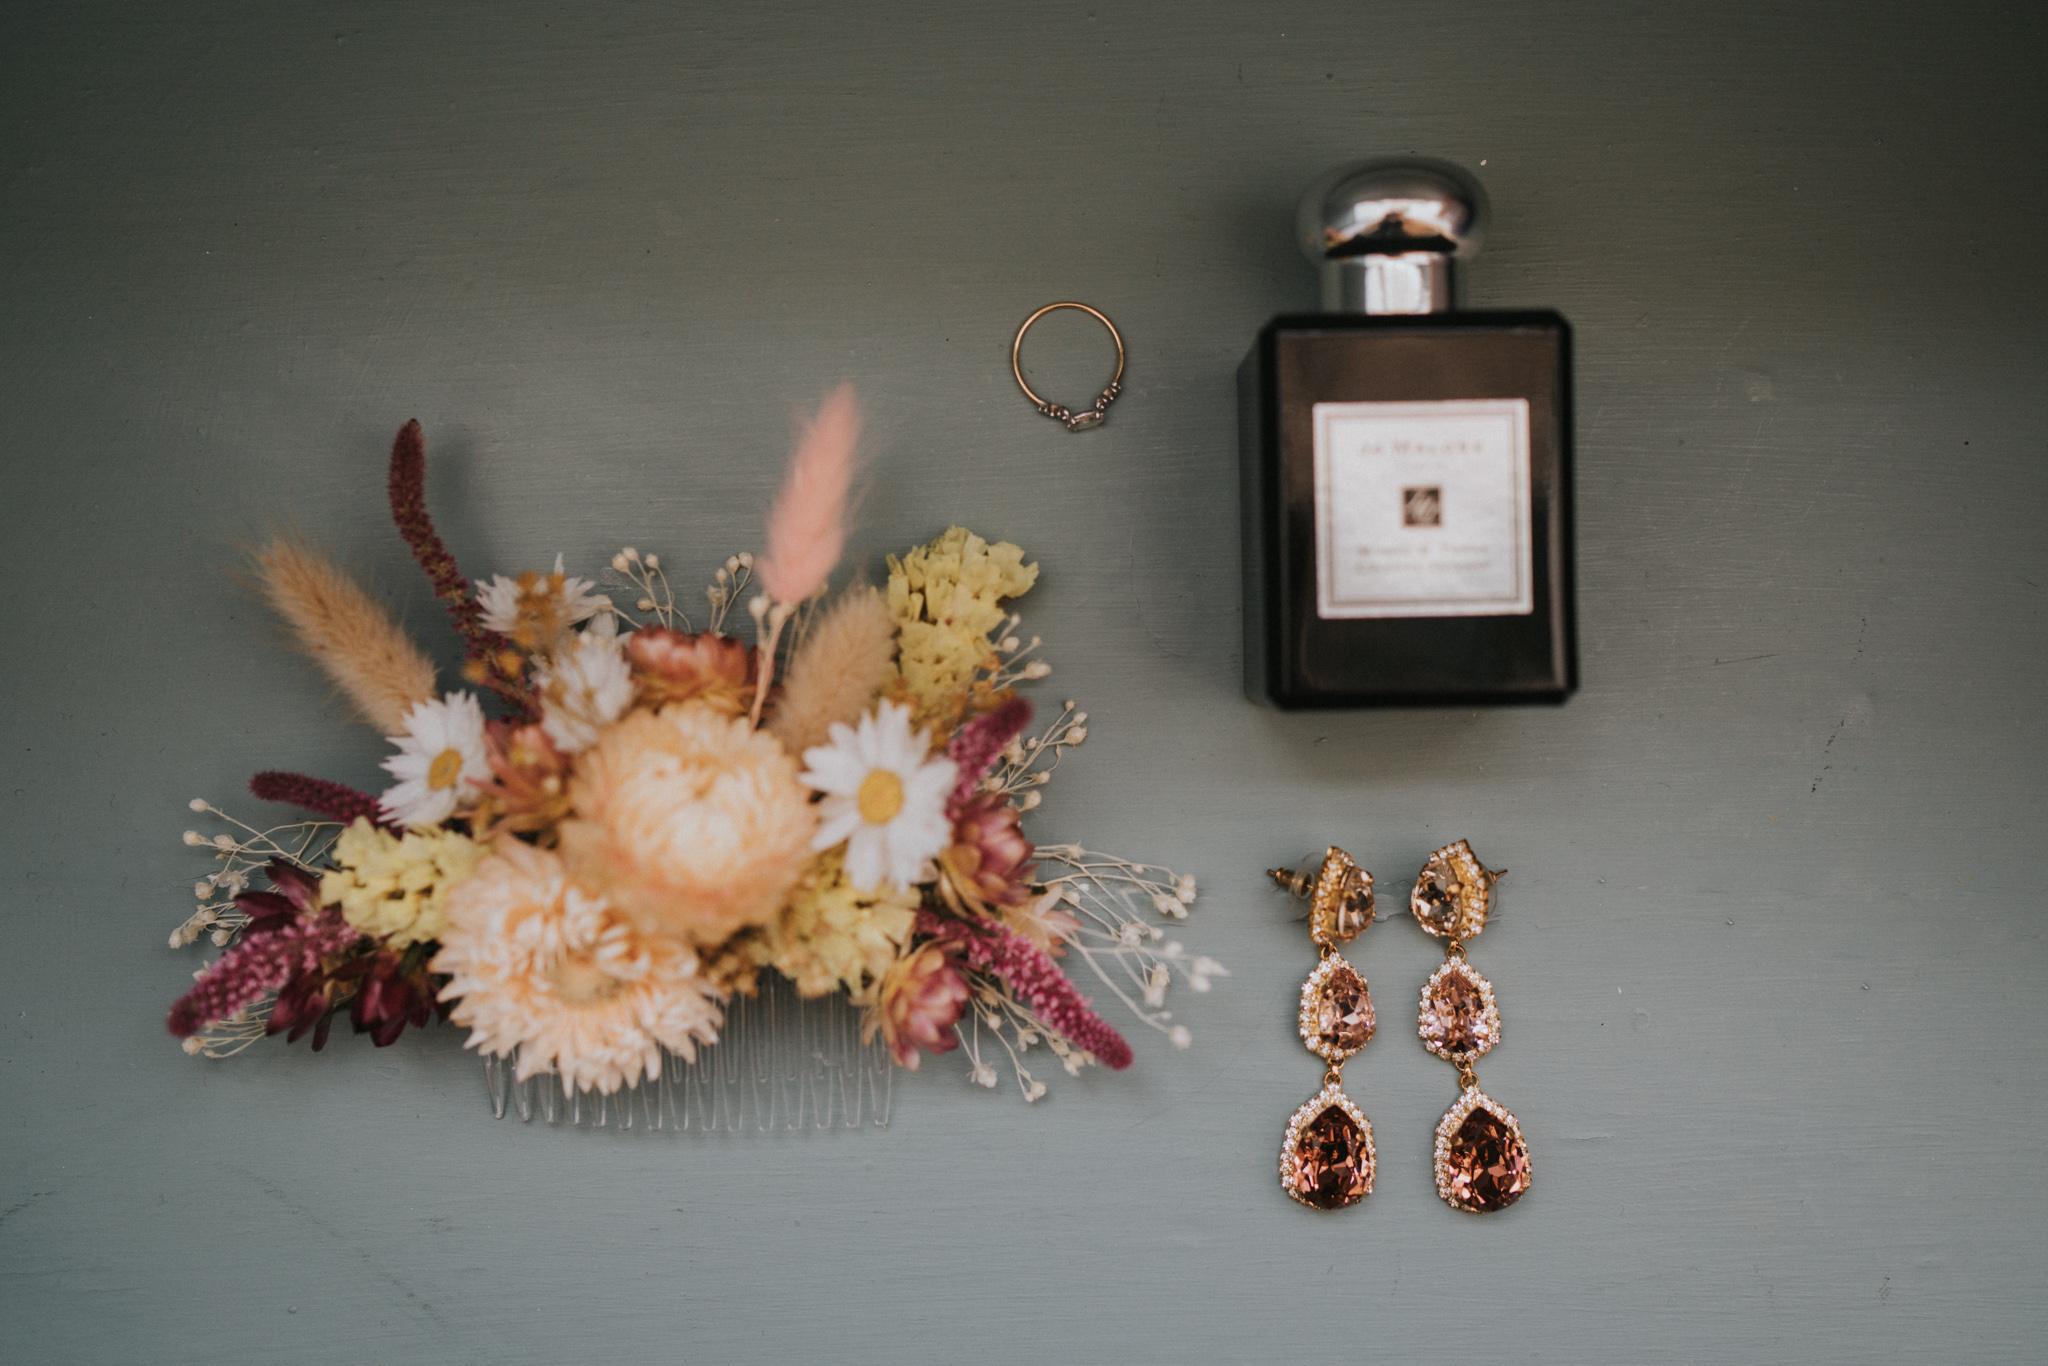 emi-Jack-boho-diy-wedding-eggington-house-grace-elizabeth-colchester-essex-alternative-wedding-photographer-suffolk-norfolk-devon (6 of 56).jpg